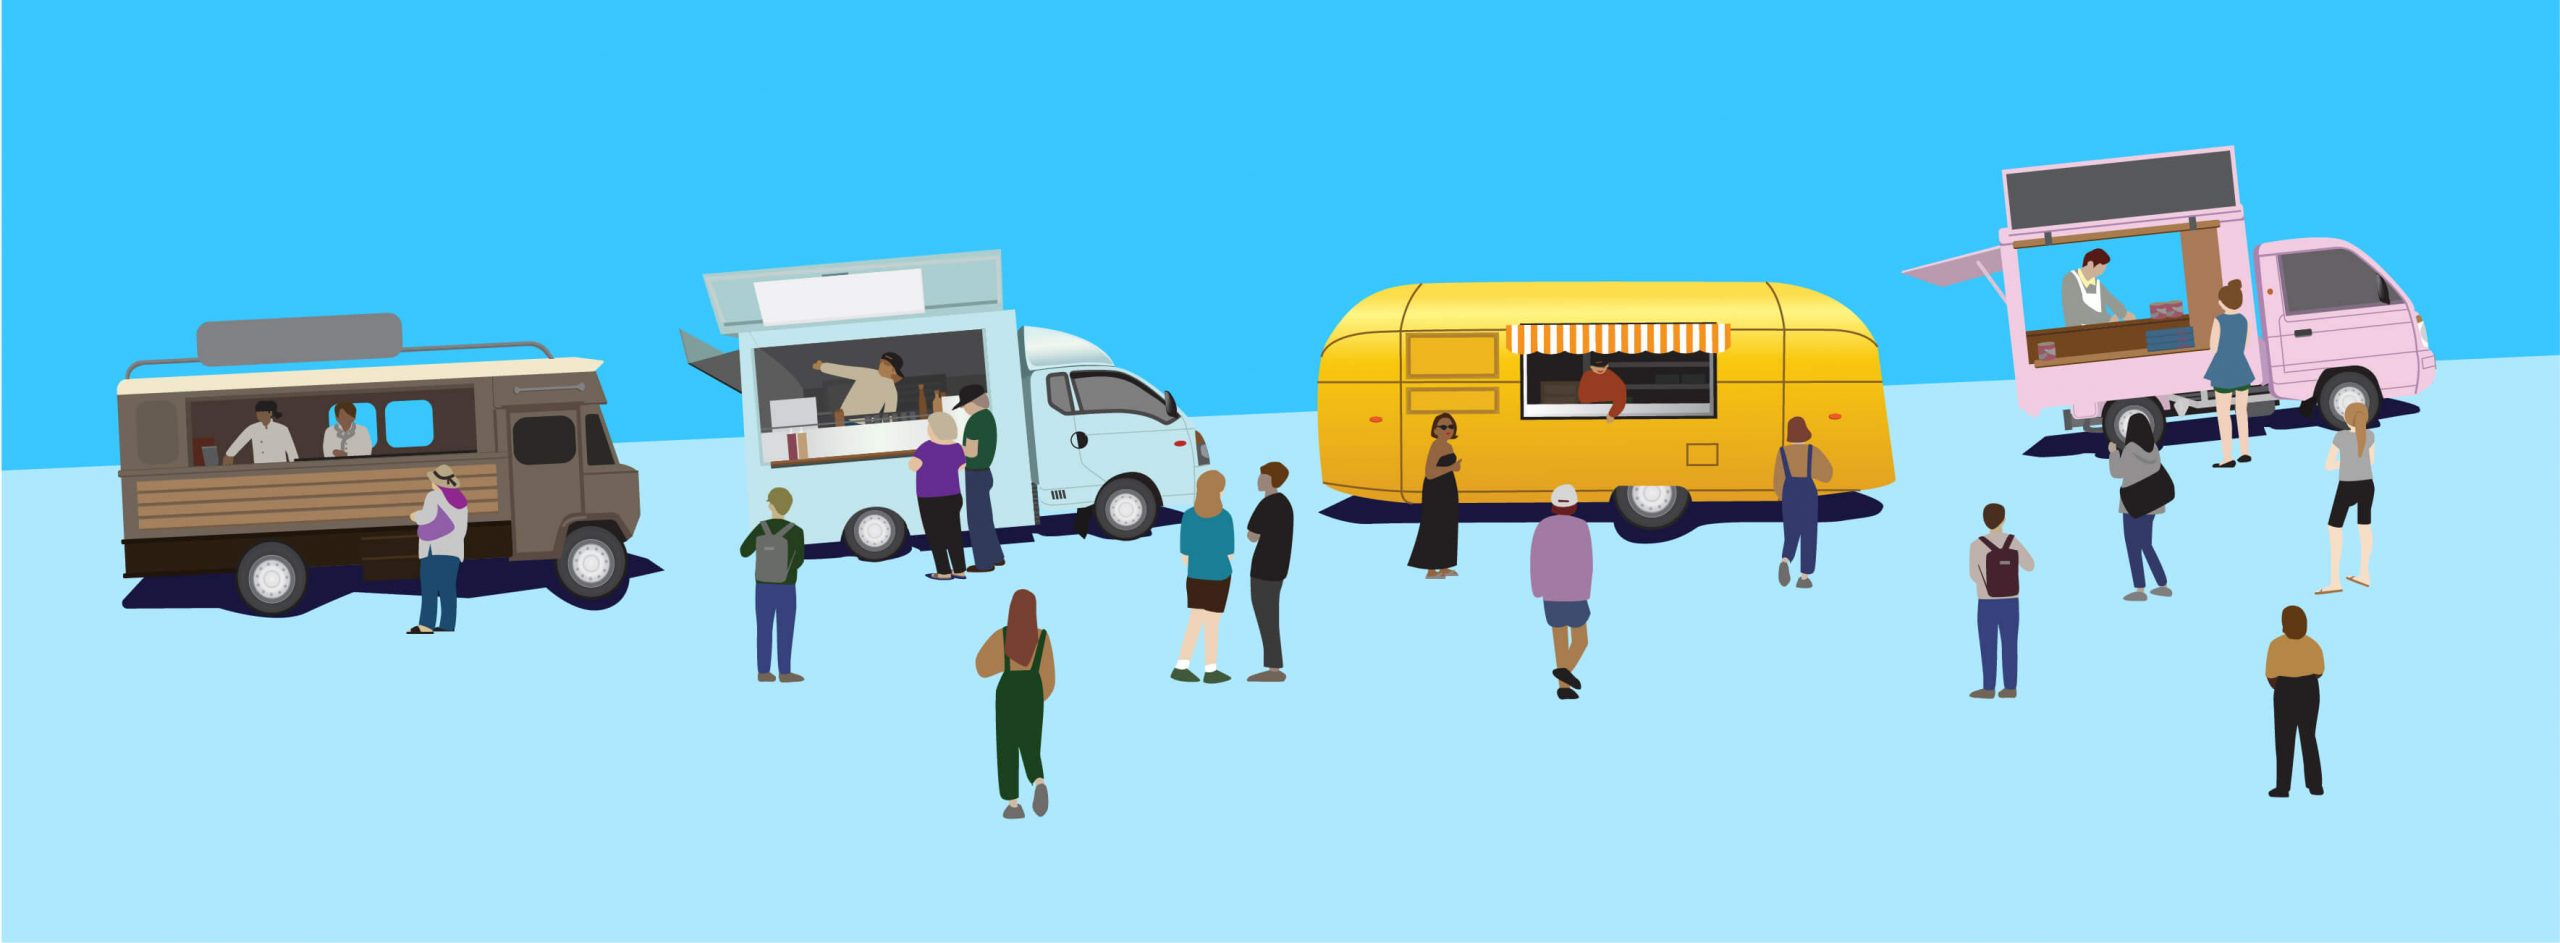 Foodtruck-illustration